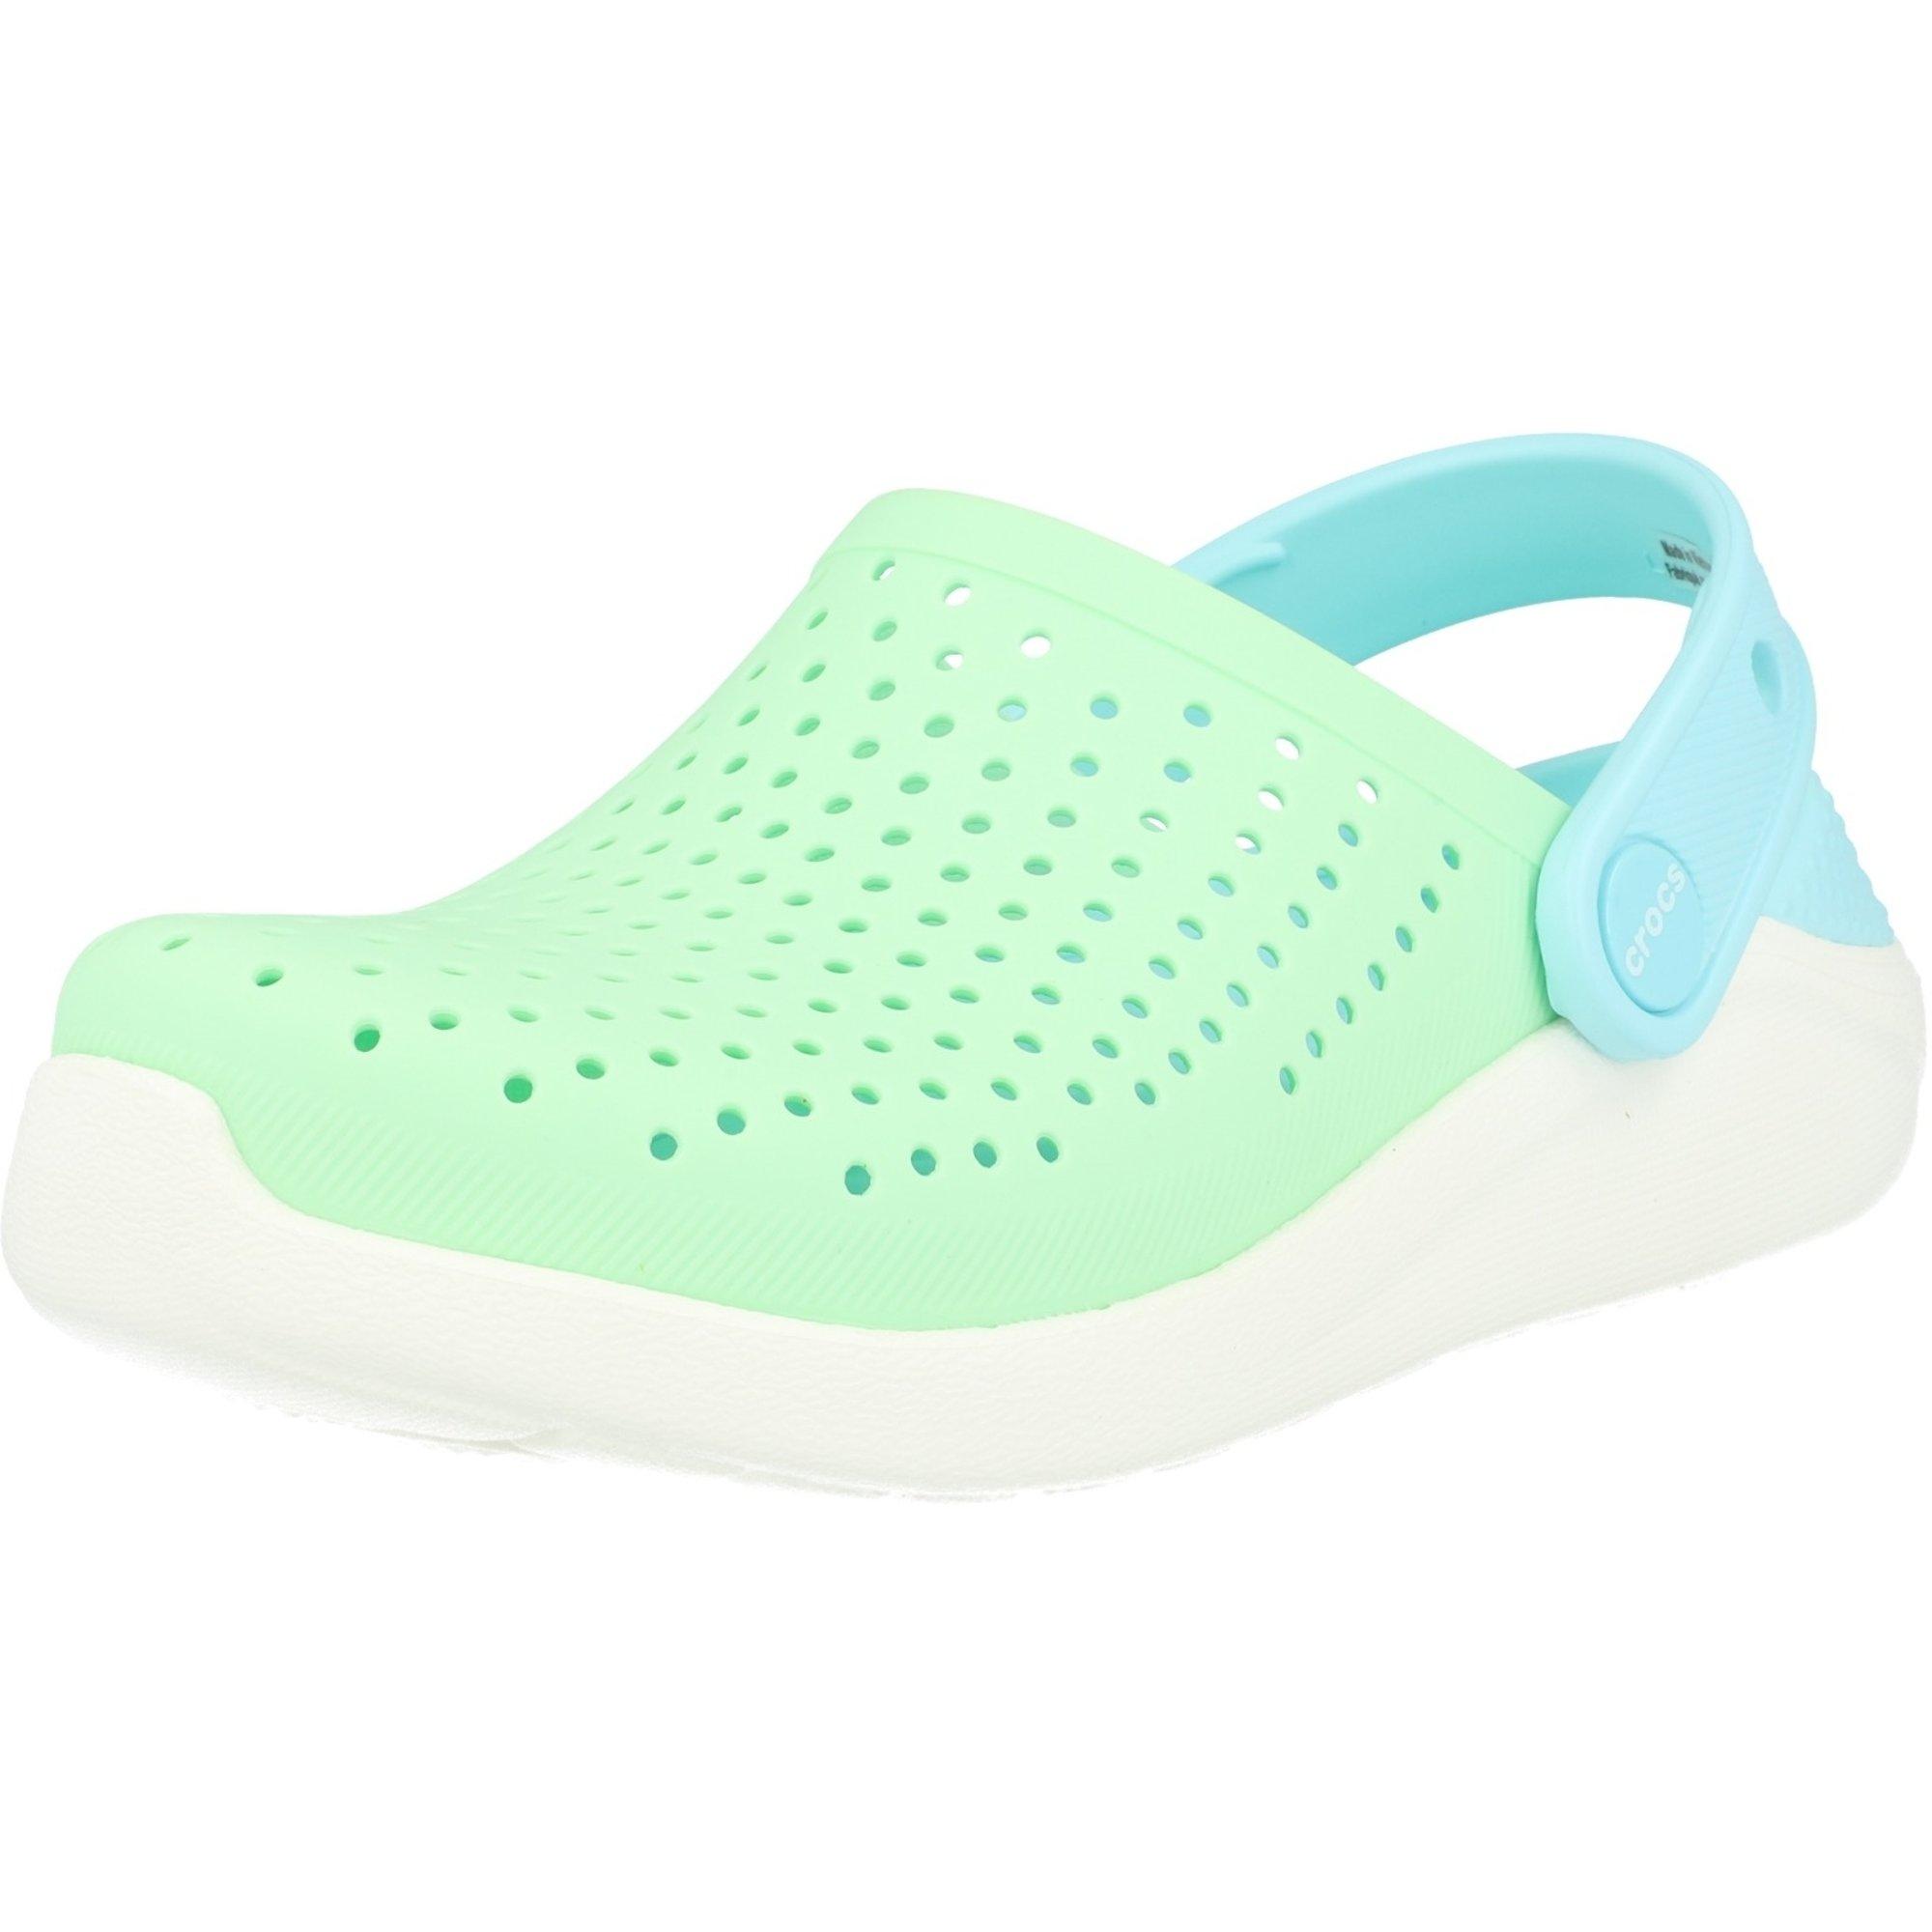 Crocs Kids LiteRide Clog Neo Mint/White Croslite